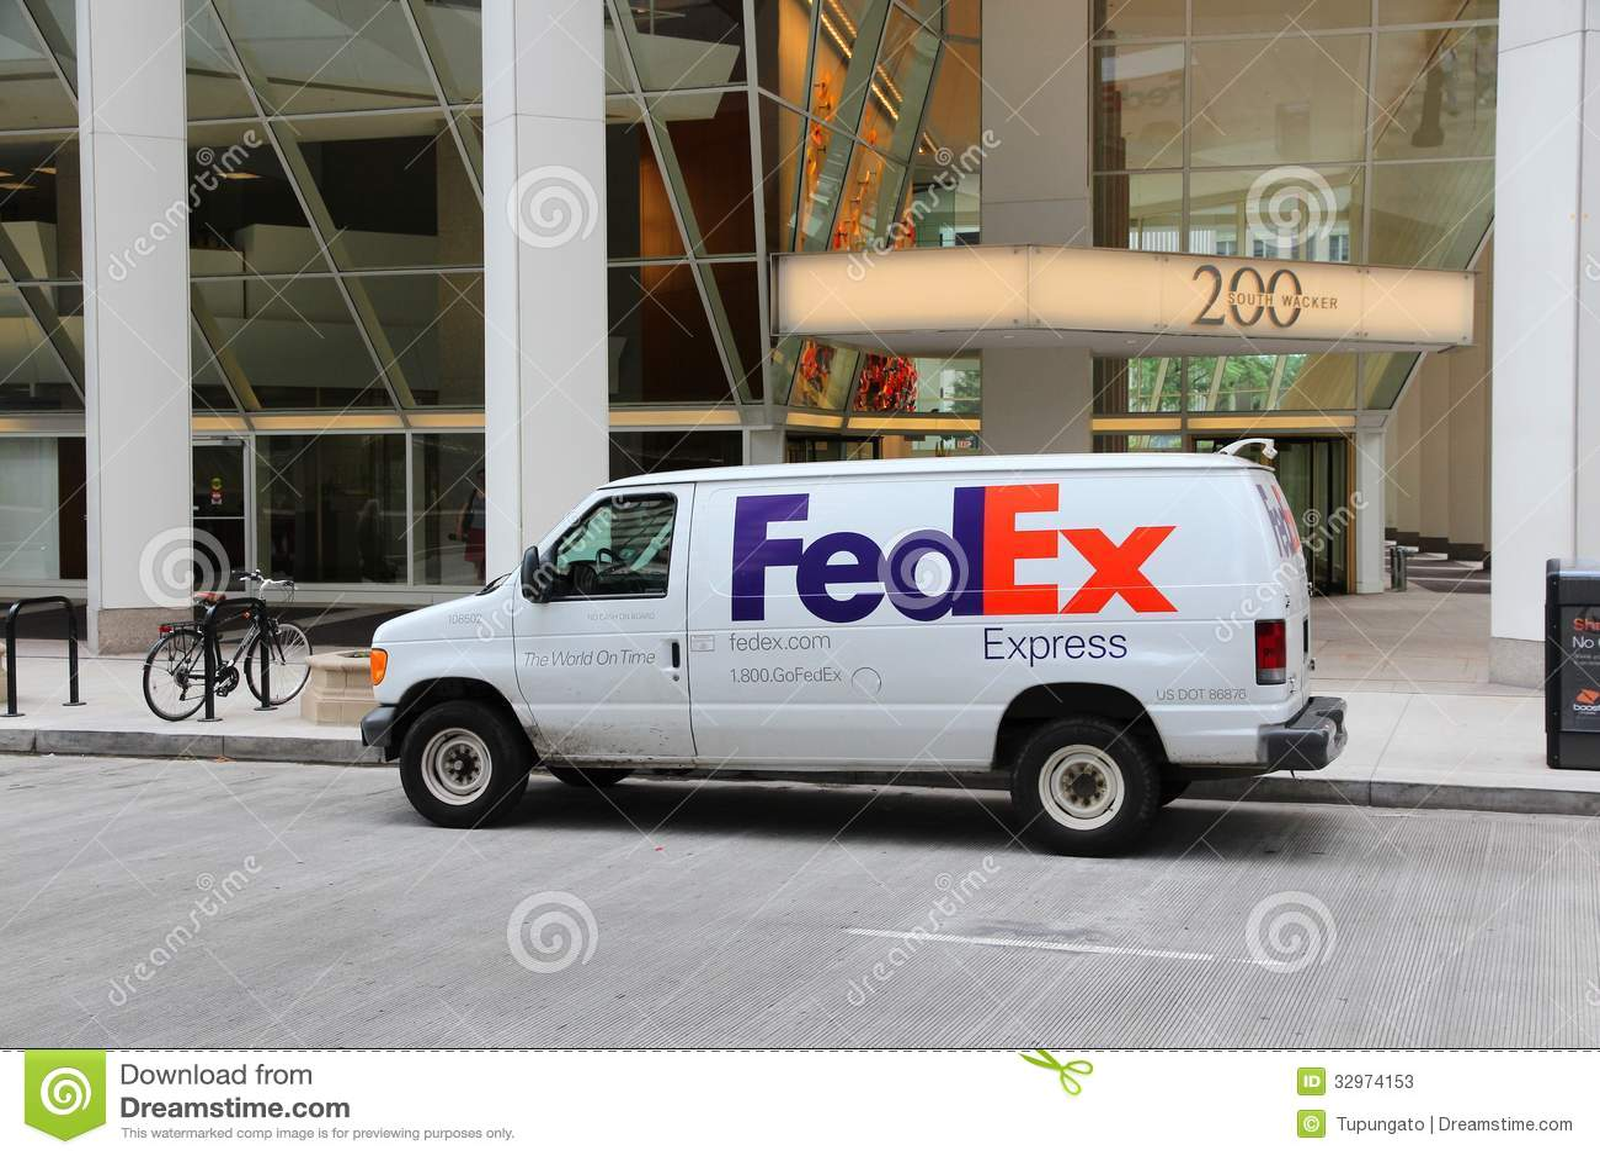 Fedex Truck Editorial Stock Photo Image 32974153